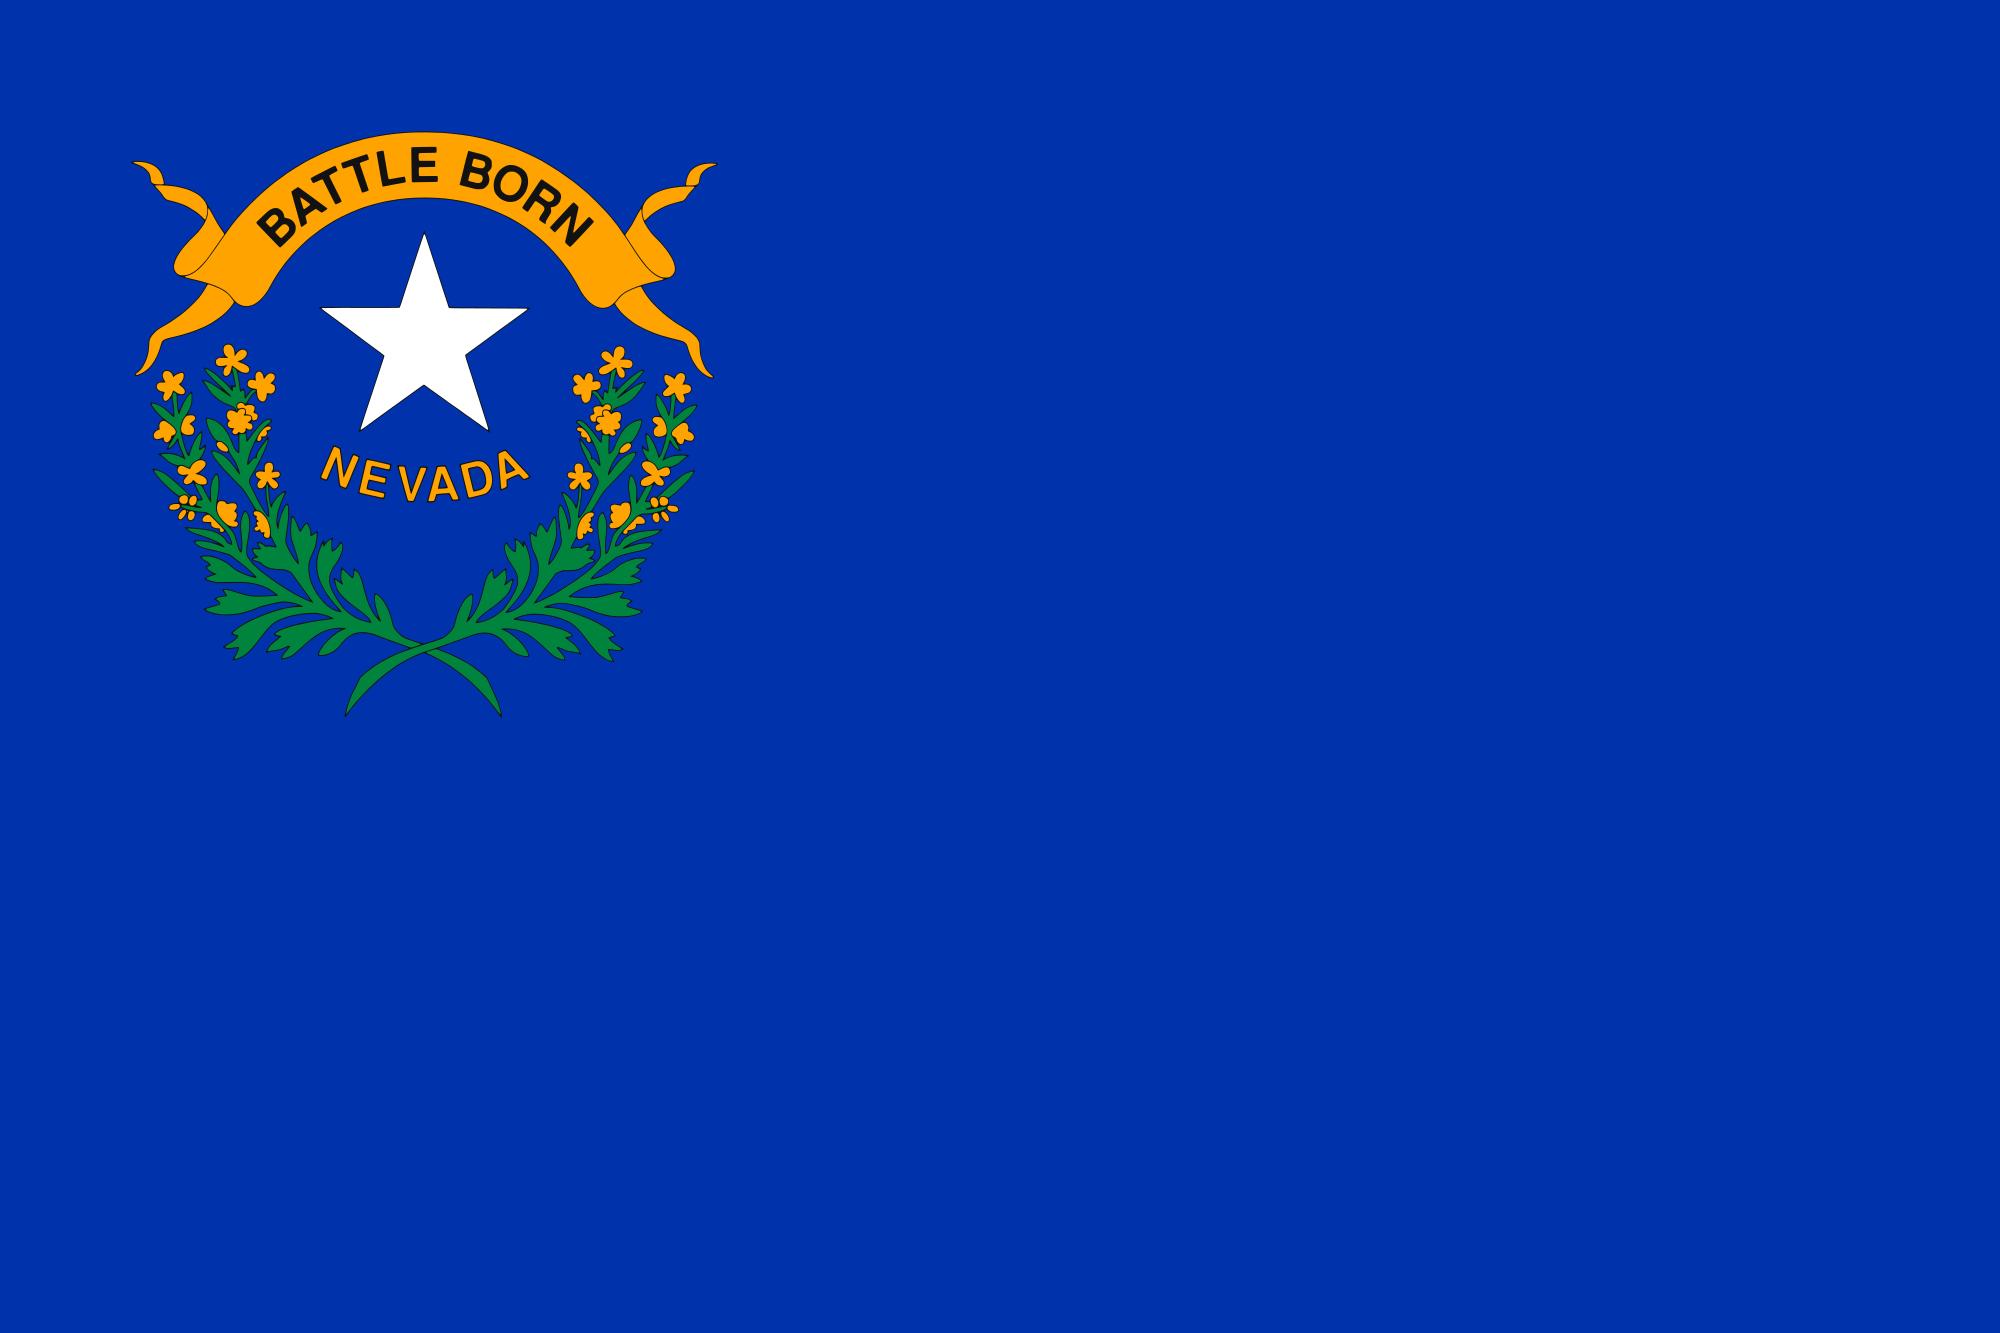 Filenevada state flagg wikimedia commons filenevada state flagg sciox Choice Image